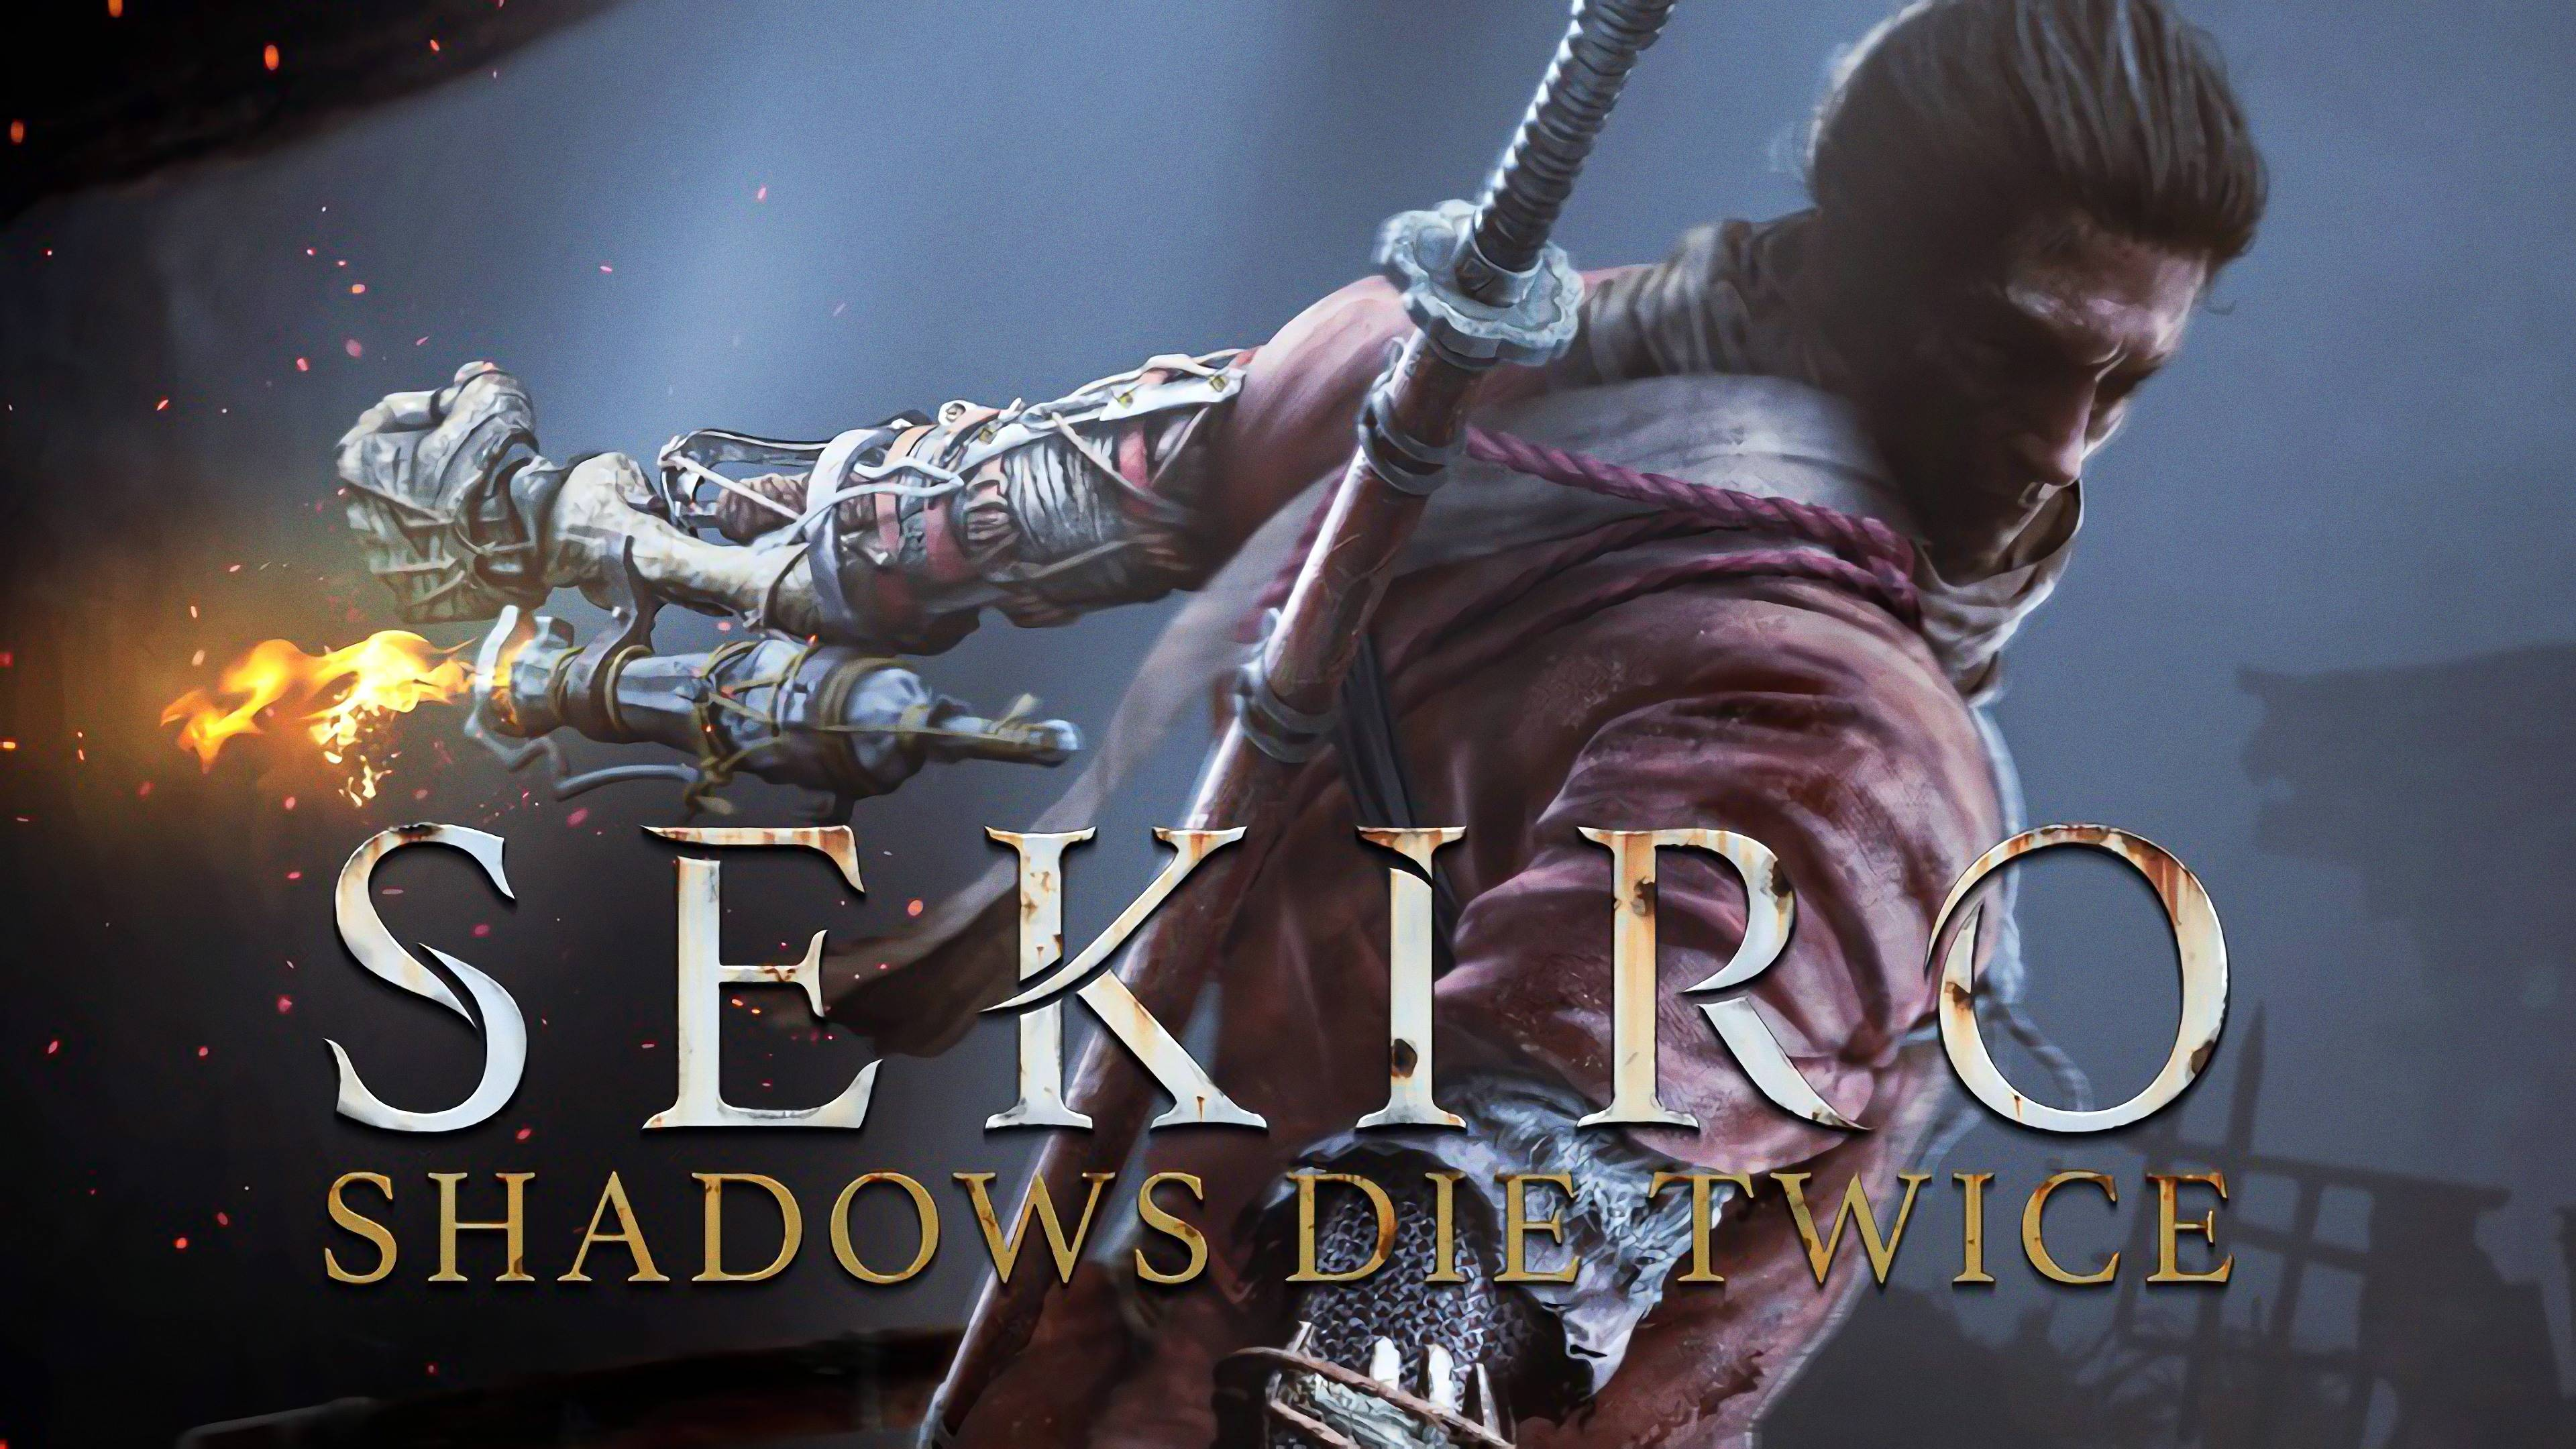 sekiro shadows die twice video game wide wallpaper 67307